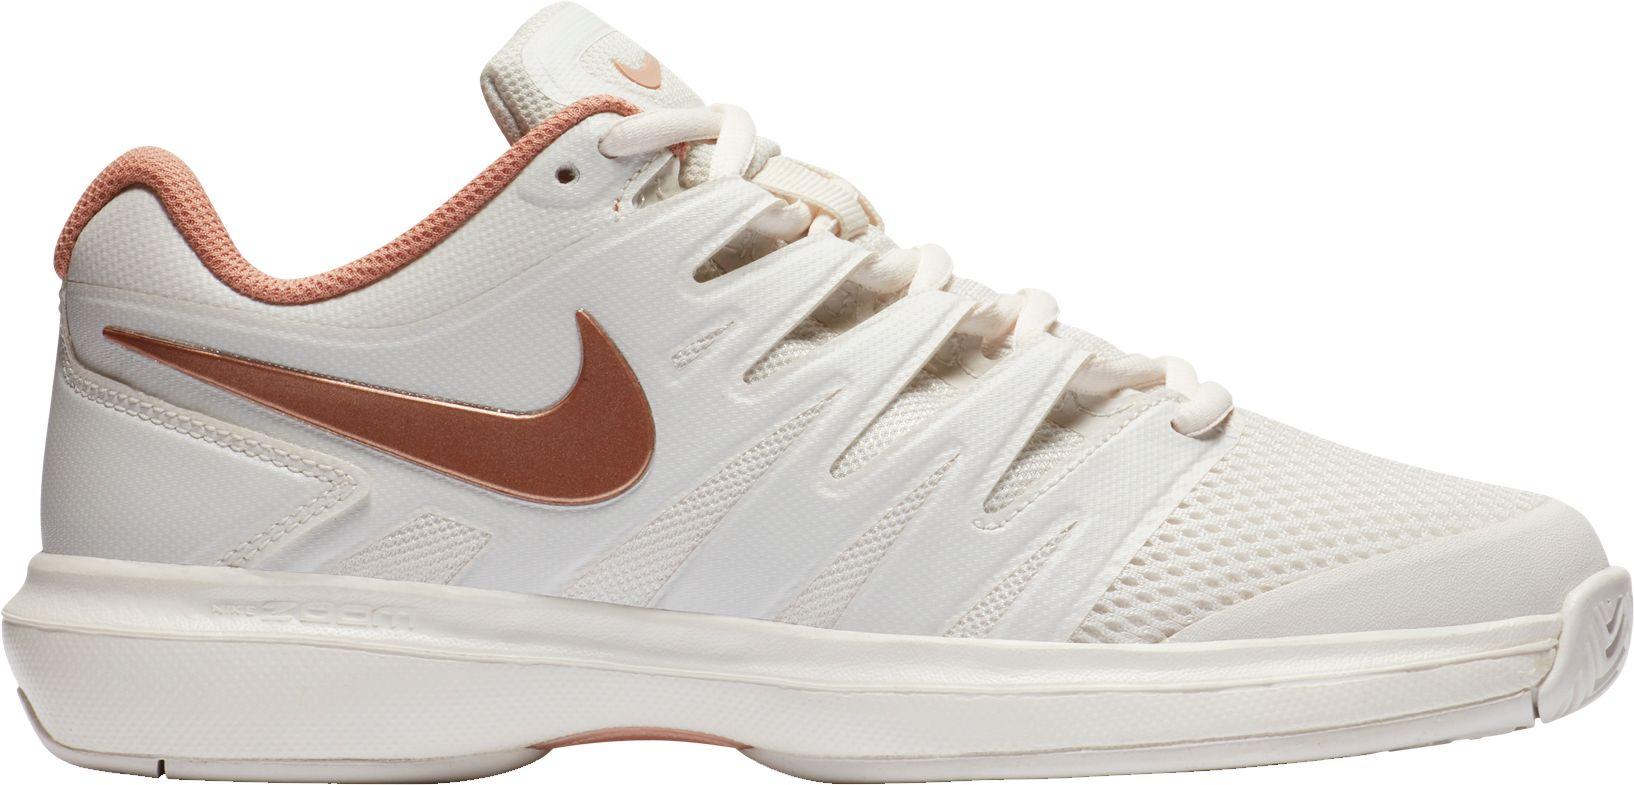 Nike Women's Air Zoom Prestige Tennis Shoes in Rose Gold, $34